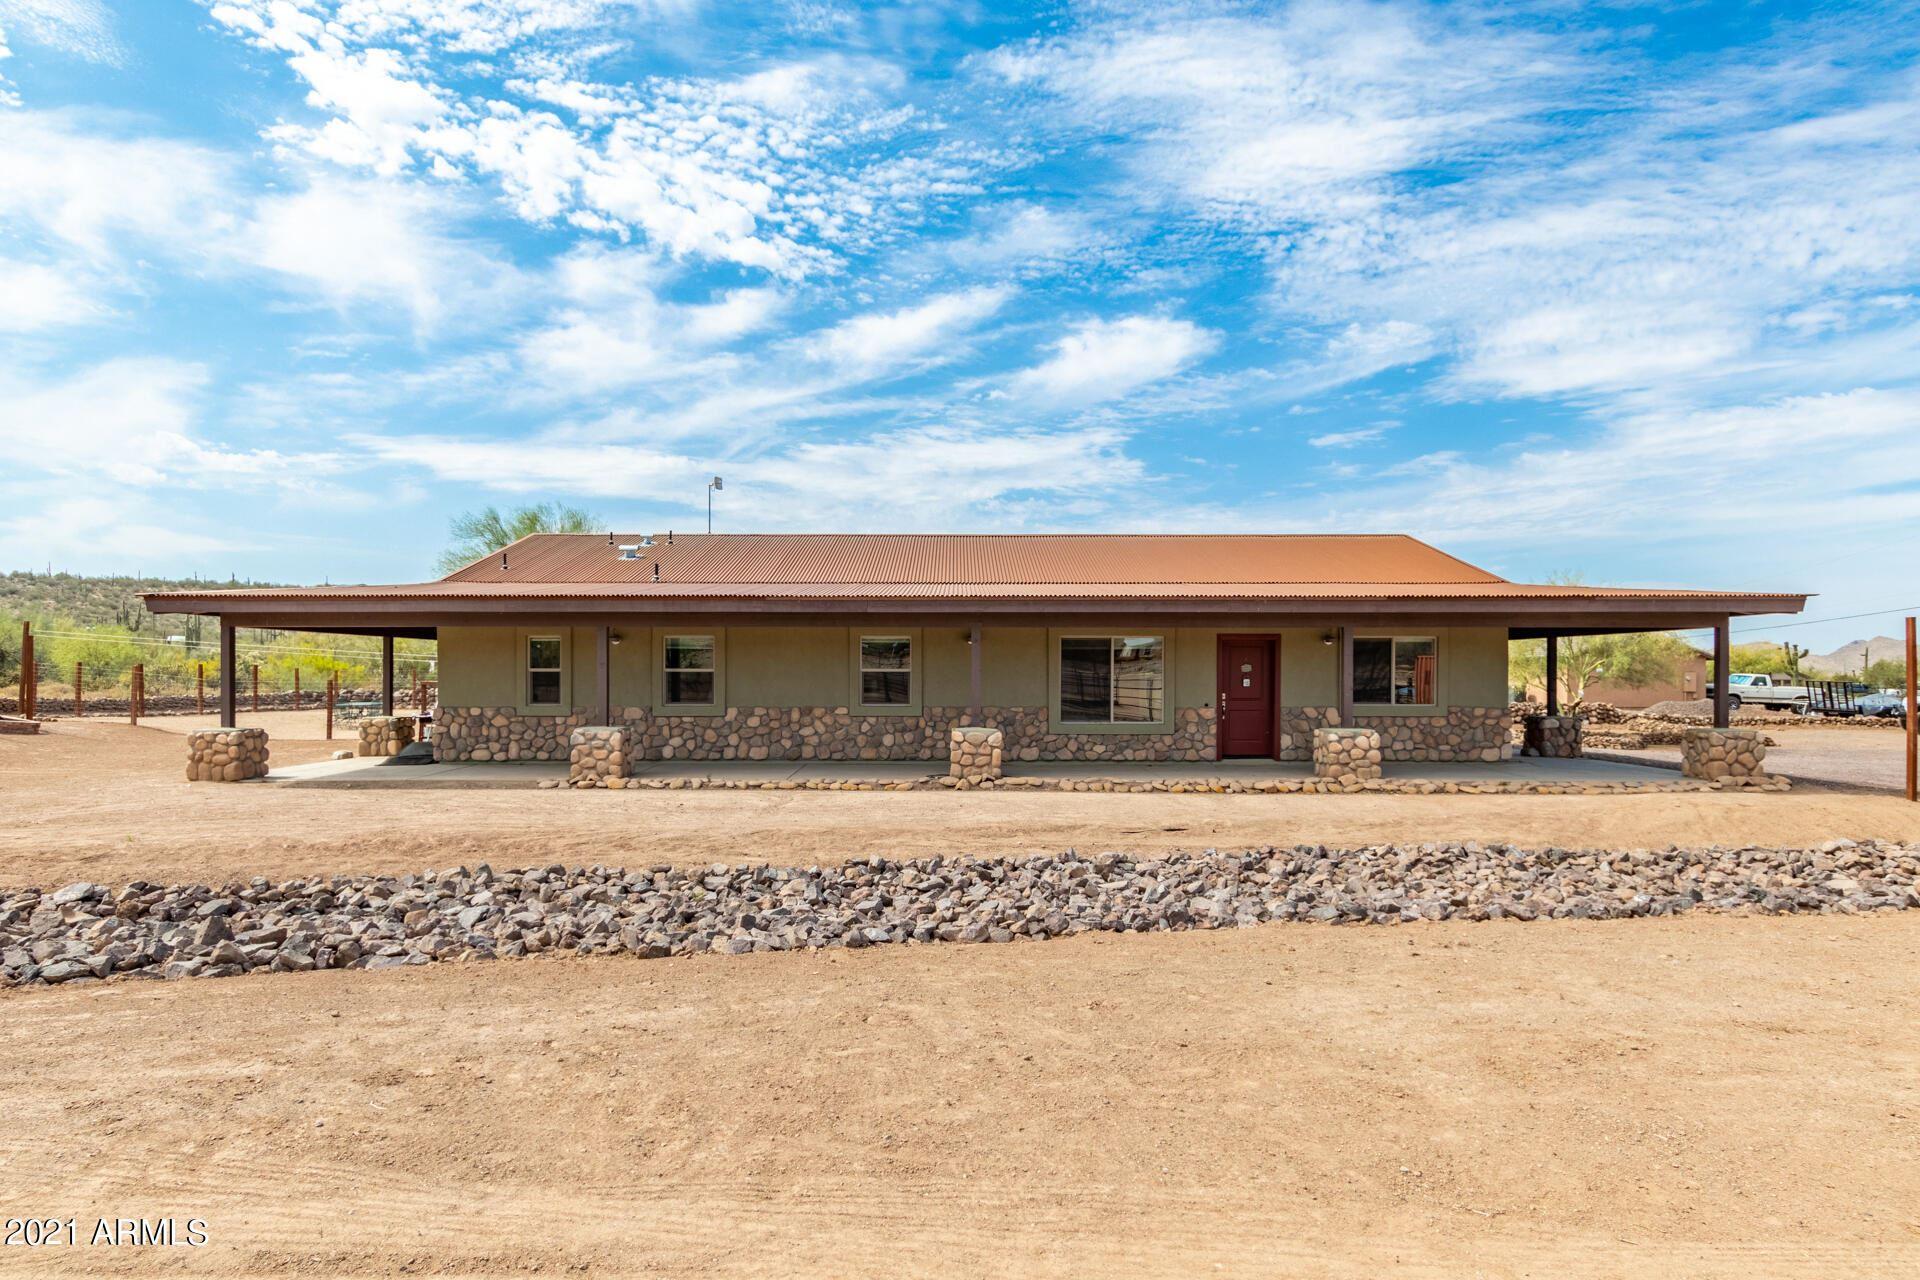 Photo of 117 W County Road, New River, AZ 85087 (MLS # 6257362)